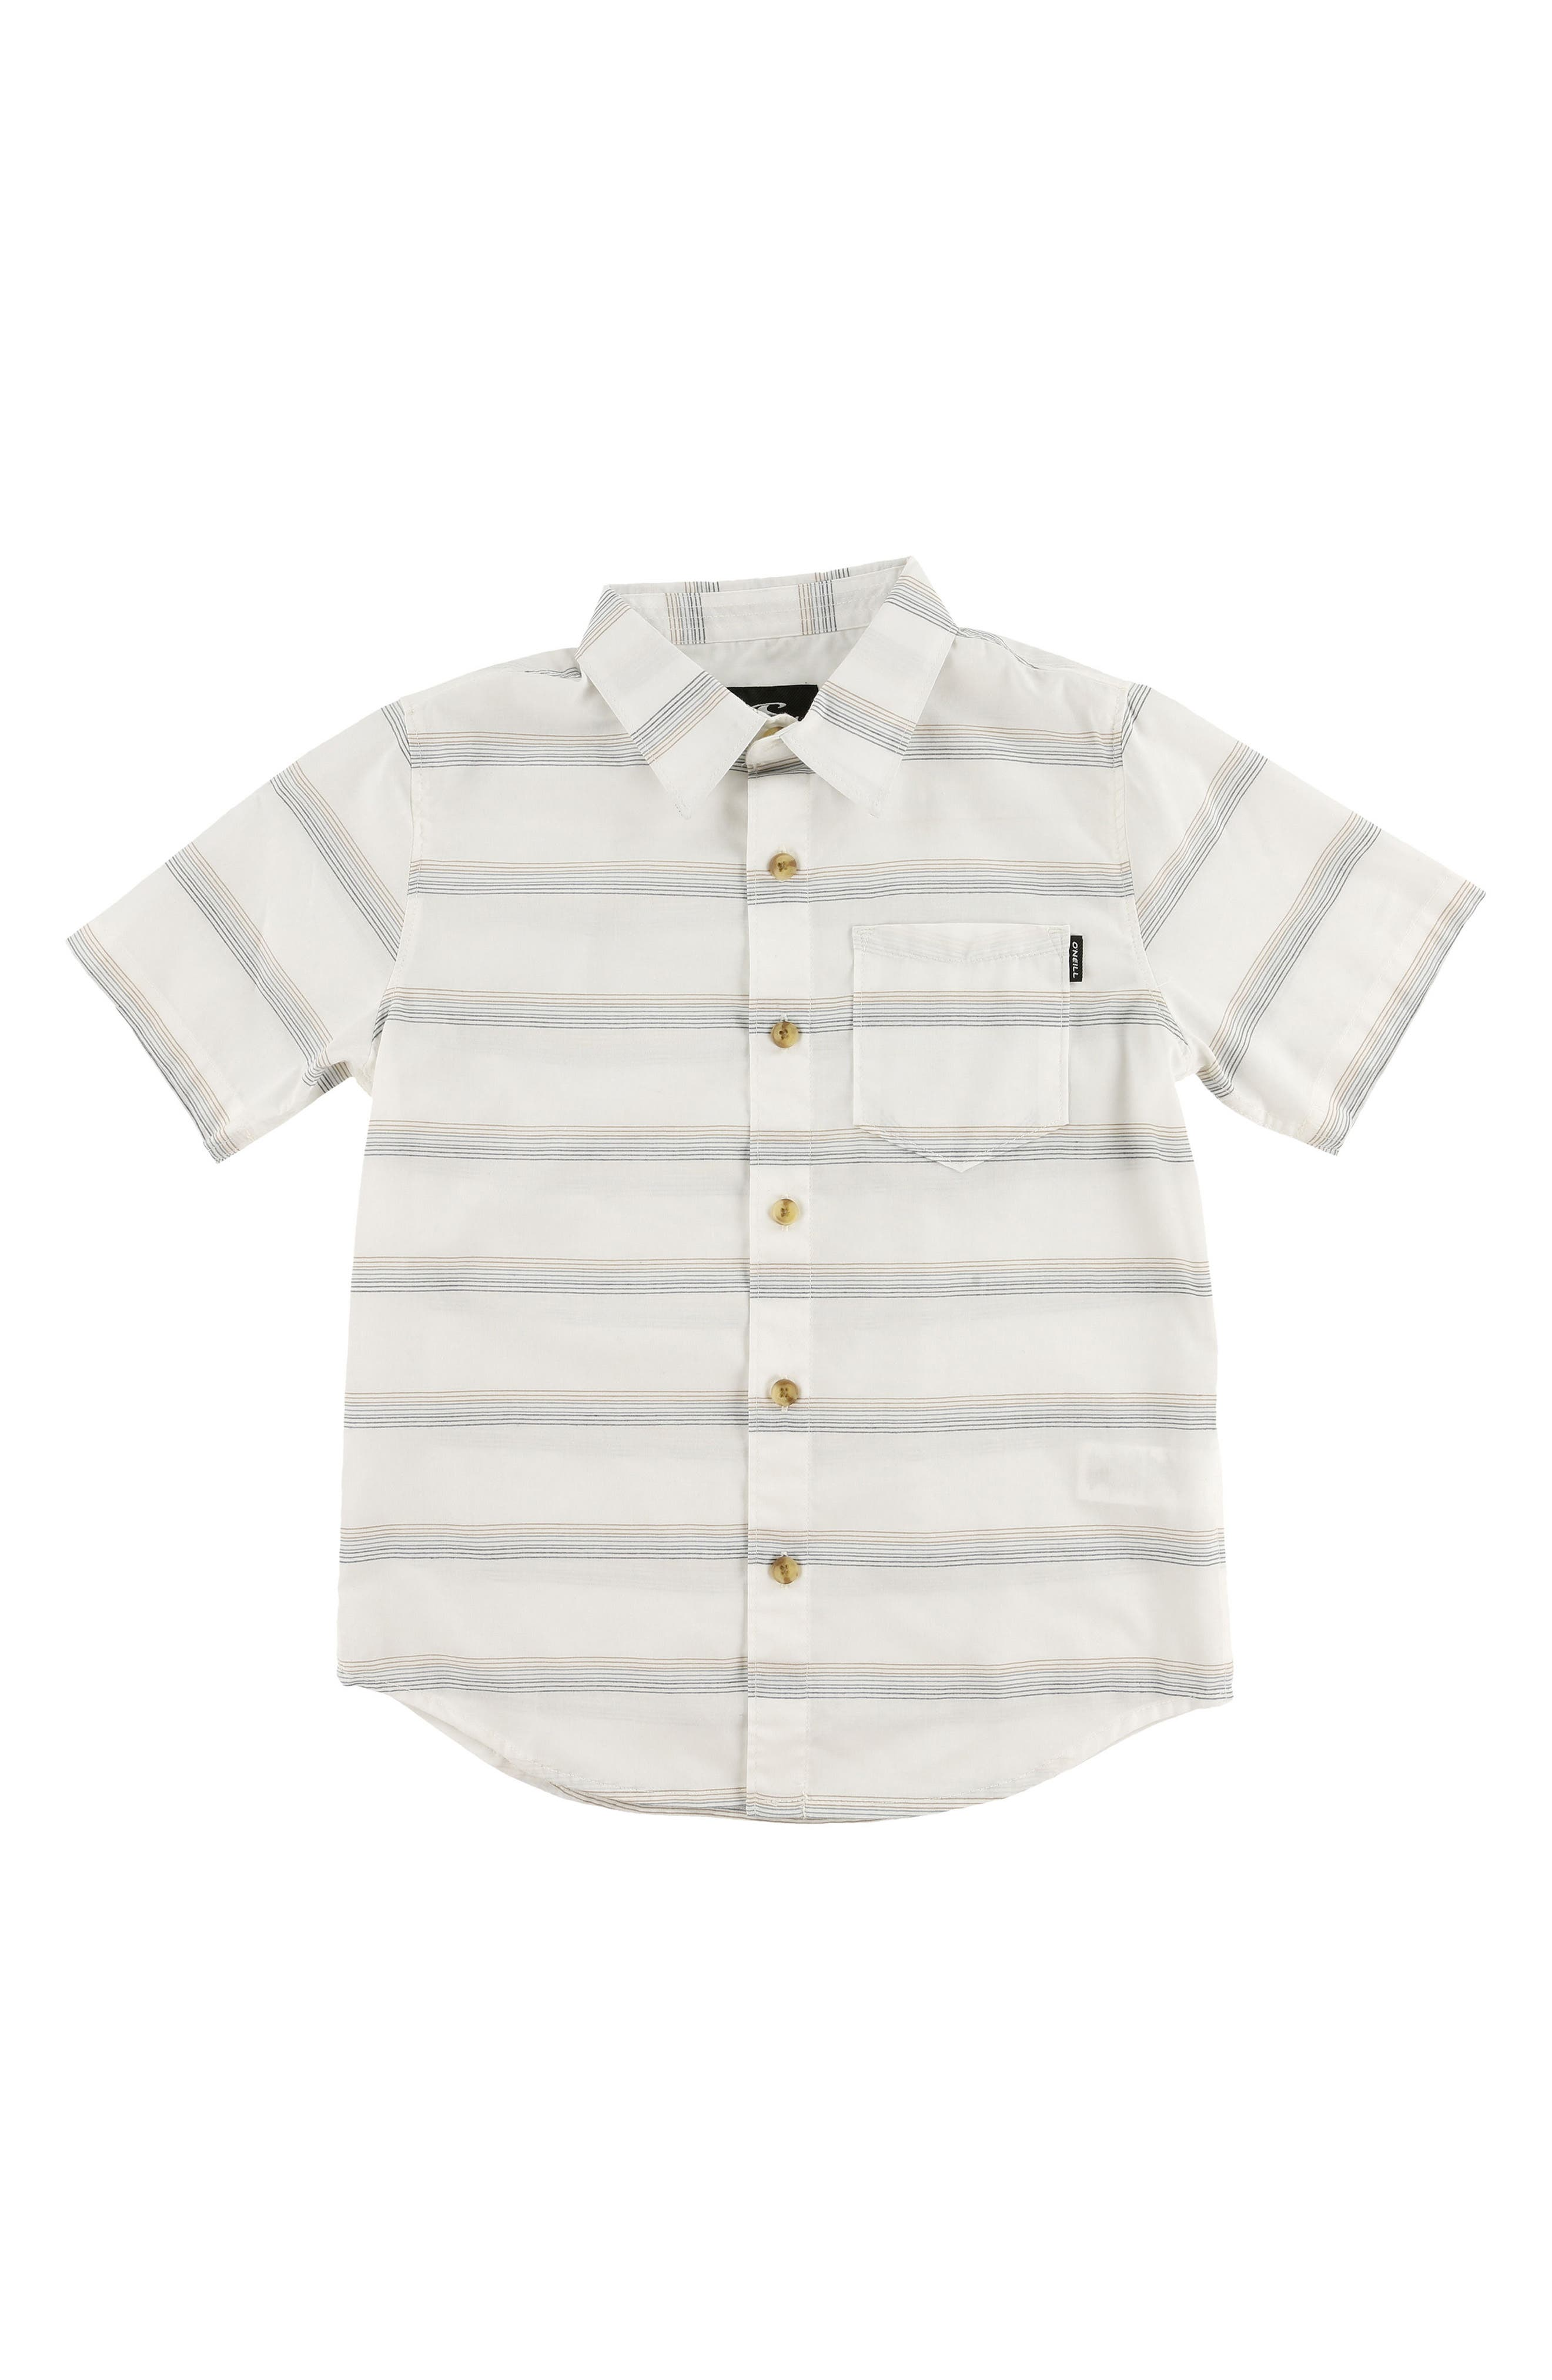 Pickett Woven Shirt,                             Main thumbnail 1, color,                             White